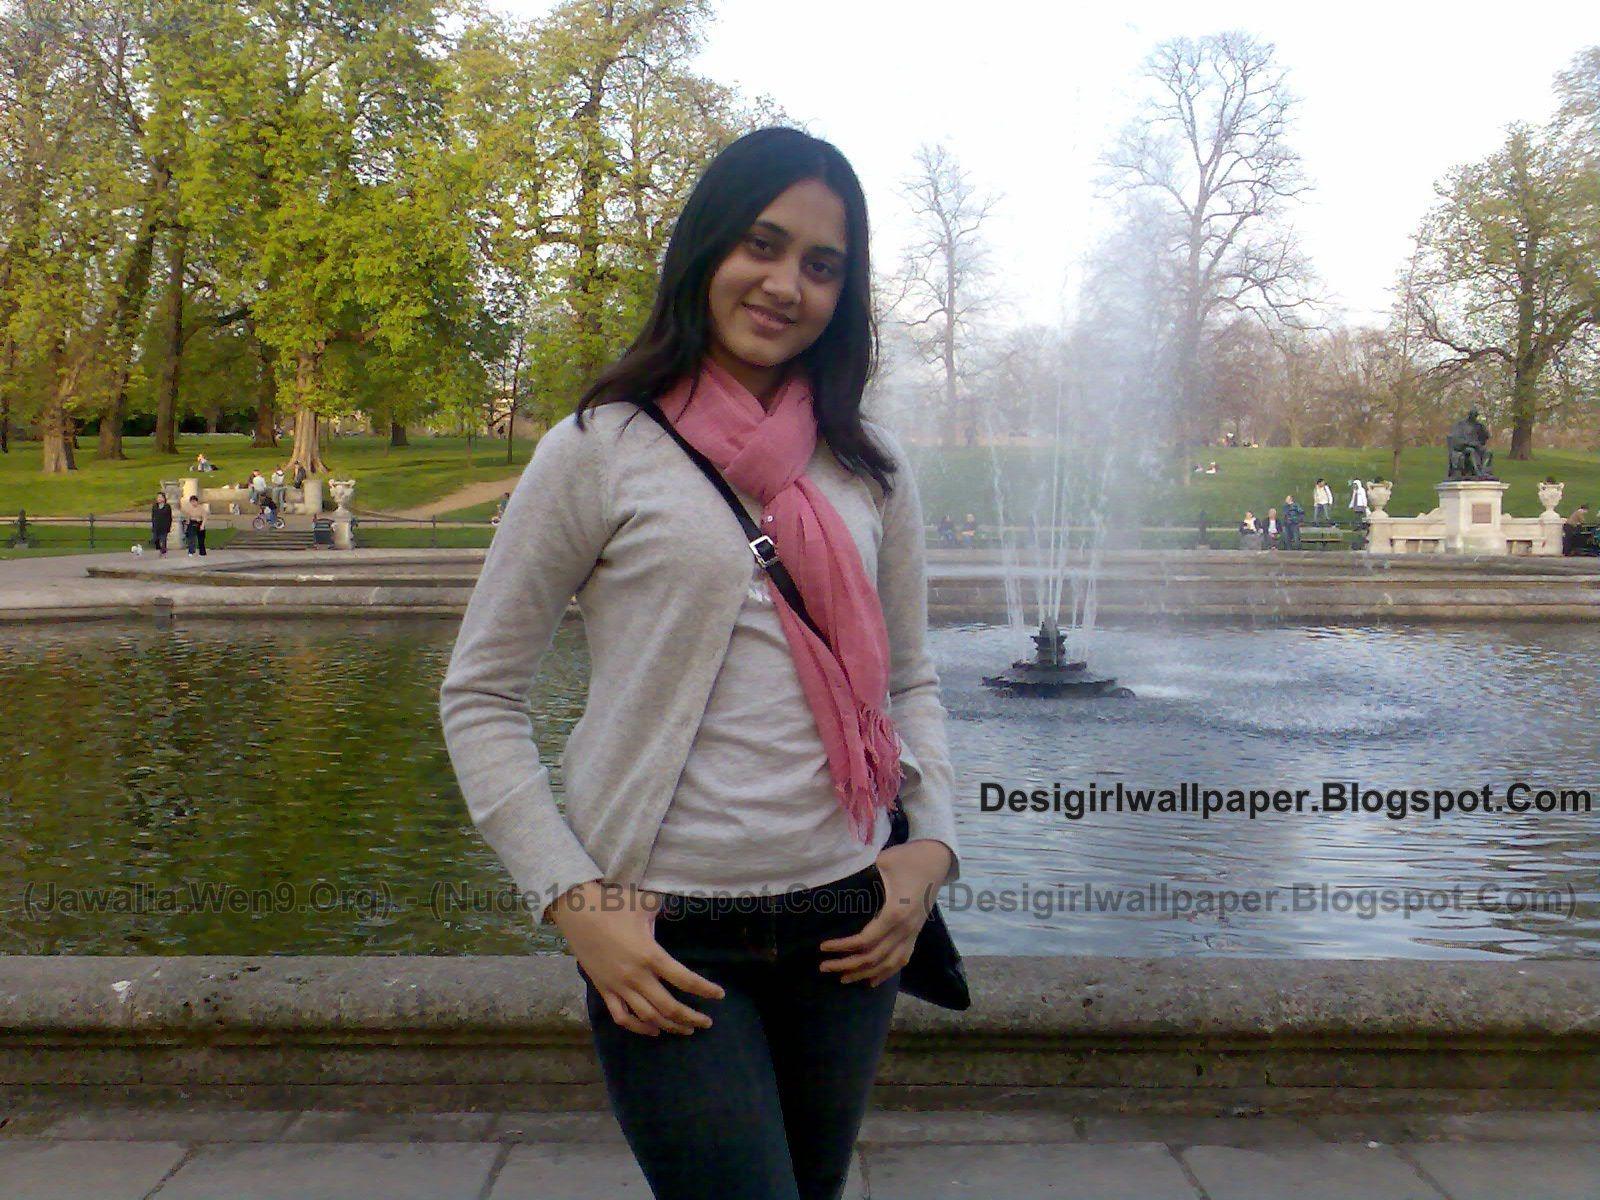 http://1.bp.blogspot.com/-f0PoNnxievU/T-M9mLSiNCI/AAAAAAAAJhk/eDN3Ilyp7uE/s1600/Image155F(Jawalia.Wen9.Org)-(Desigirlwallpaper.blogspot.com).jpg